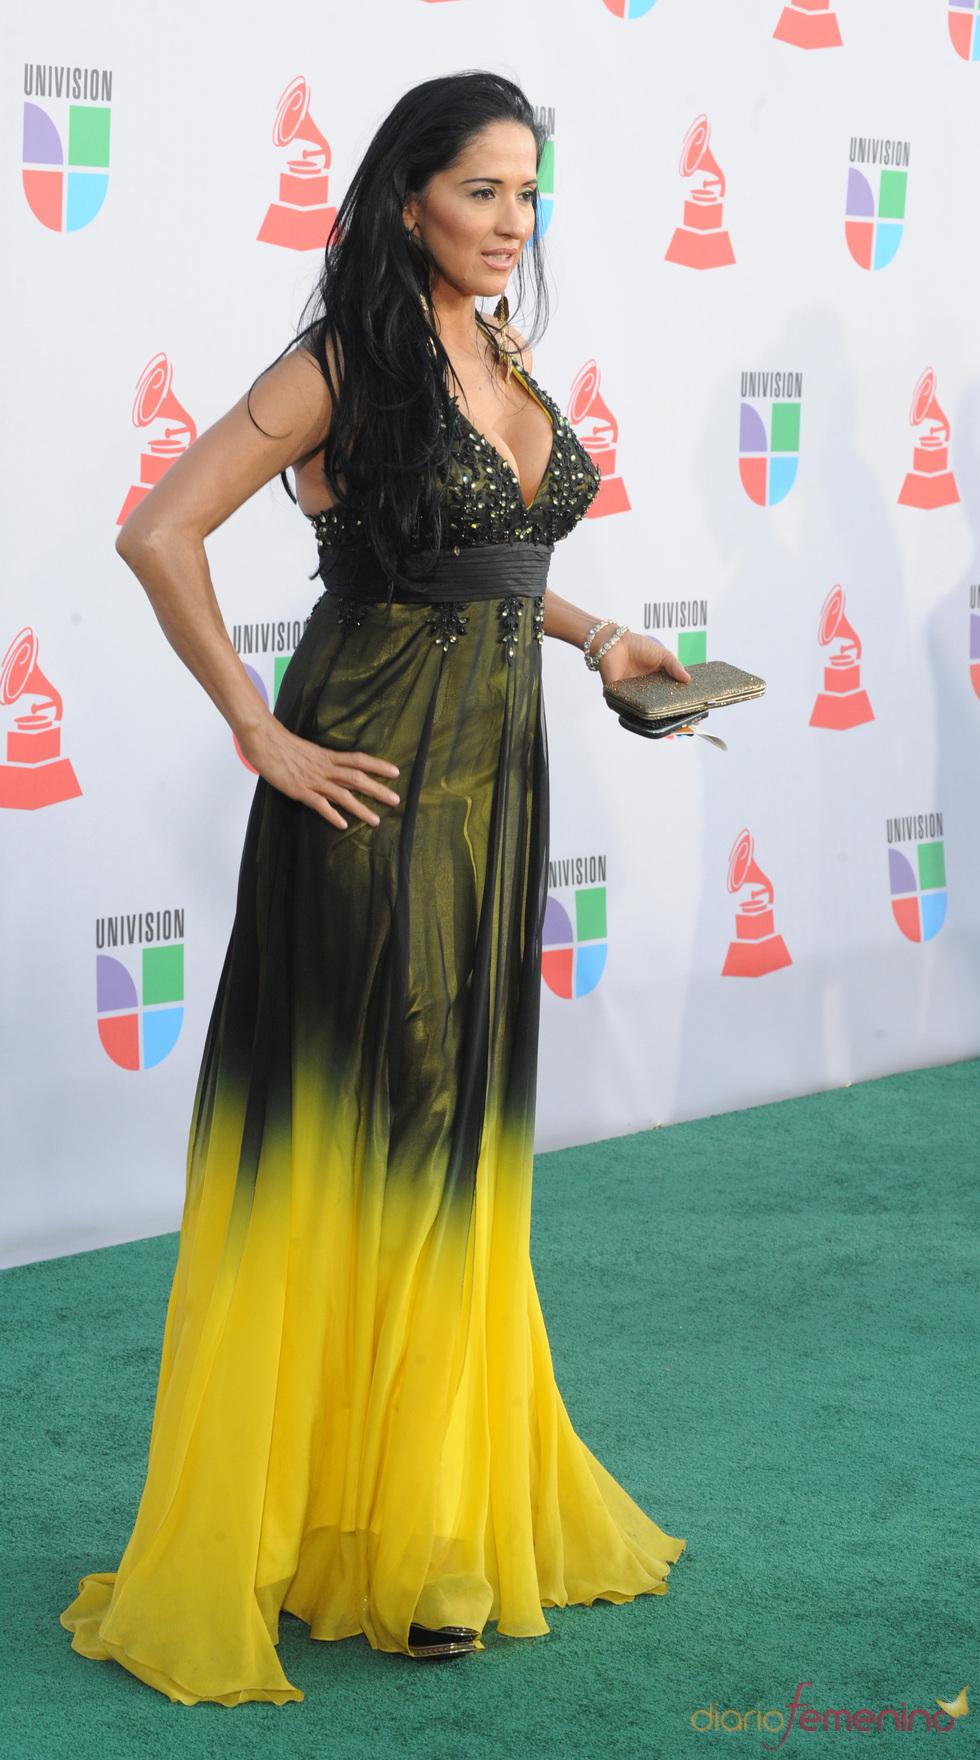 Amalia Aviles en los Grammy Latino 2010